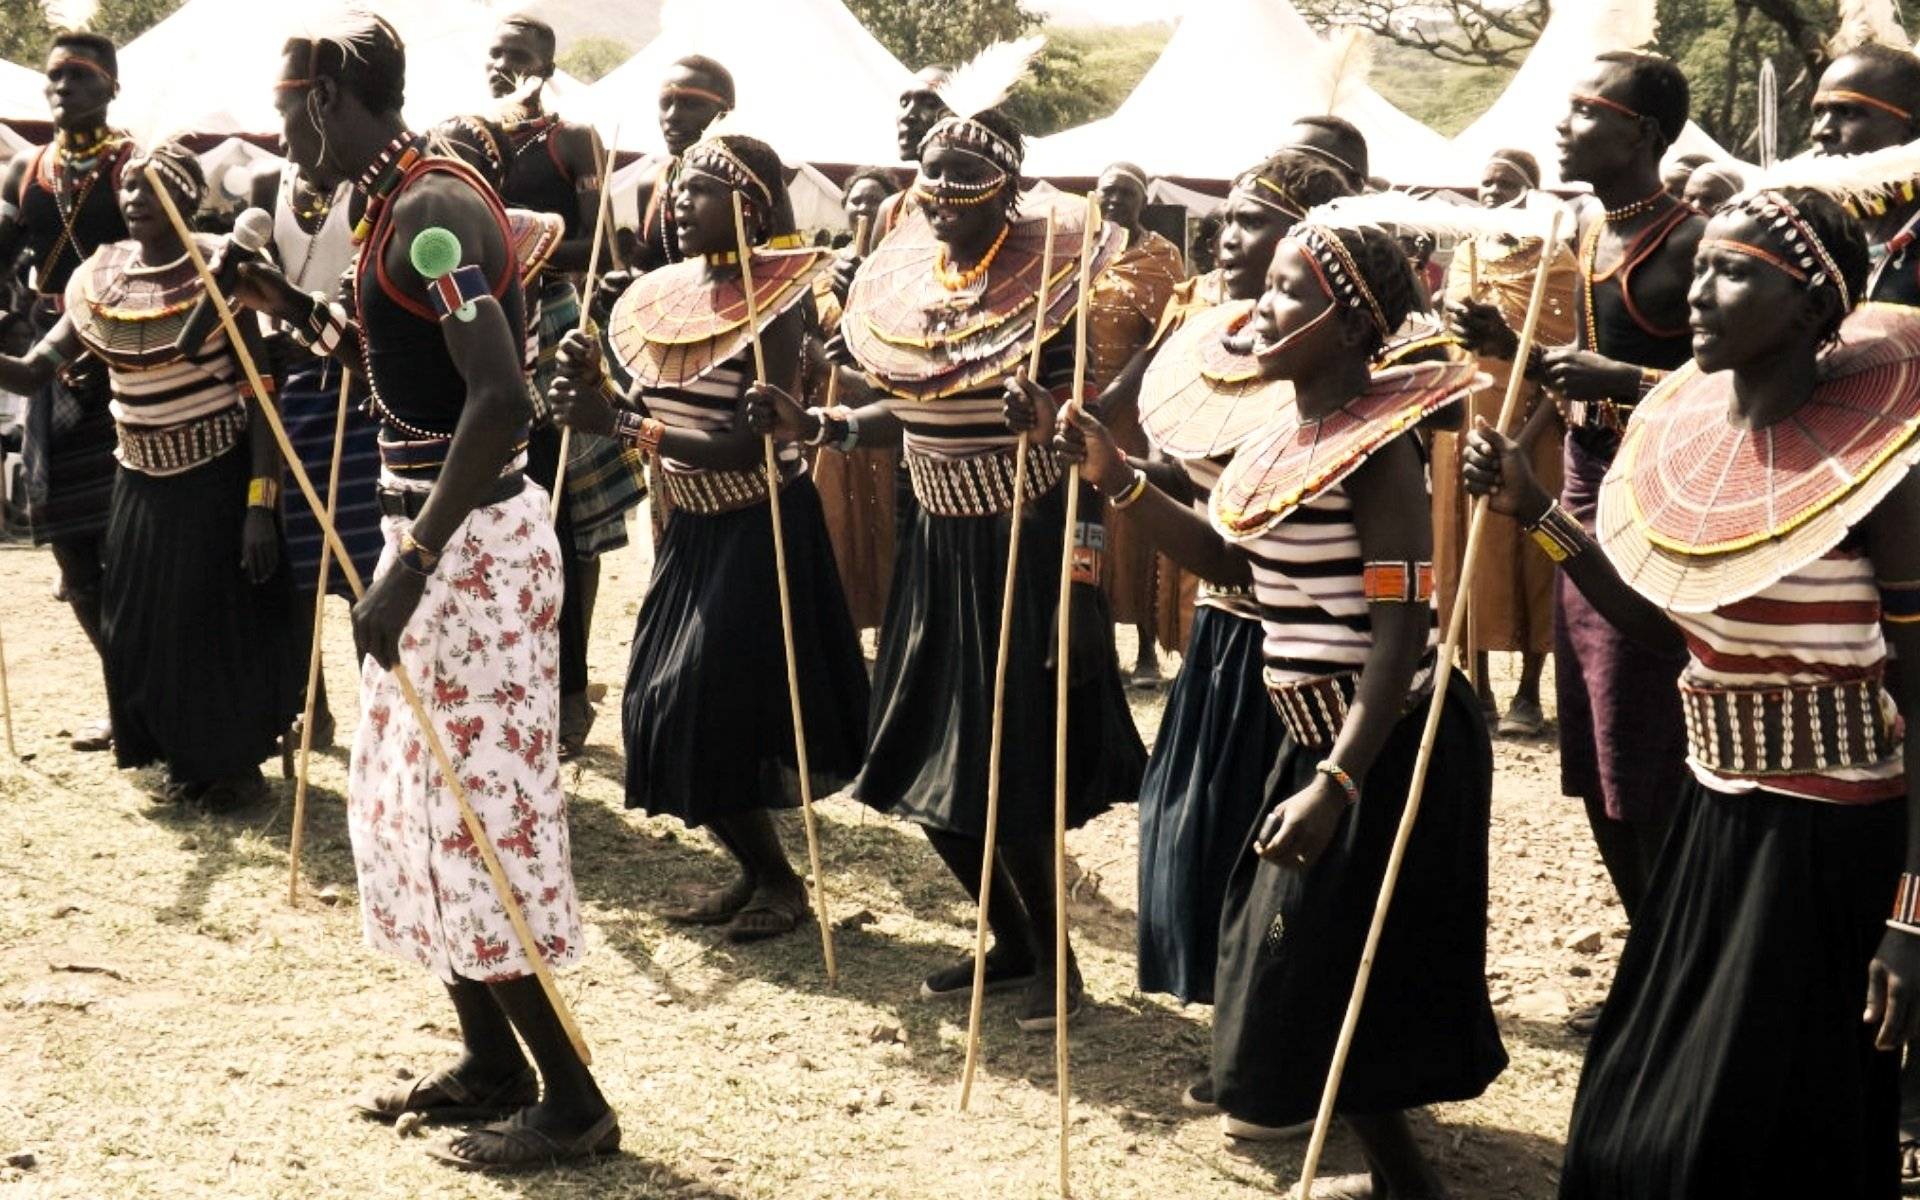 Pokot dancers at the 2014 Marsabit Lake Turkana Cultural Festival